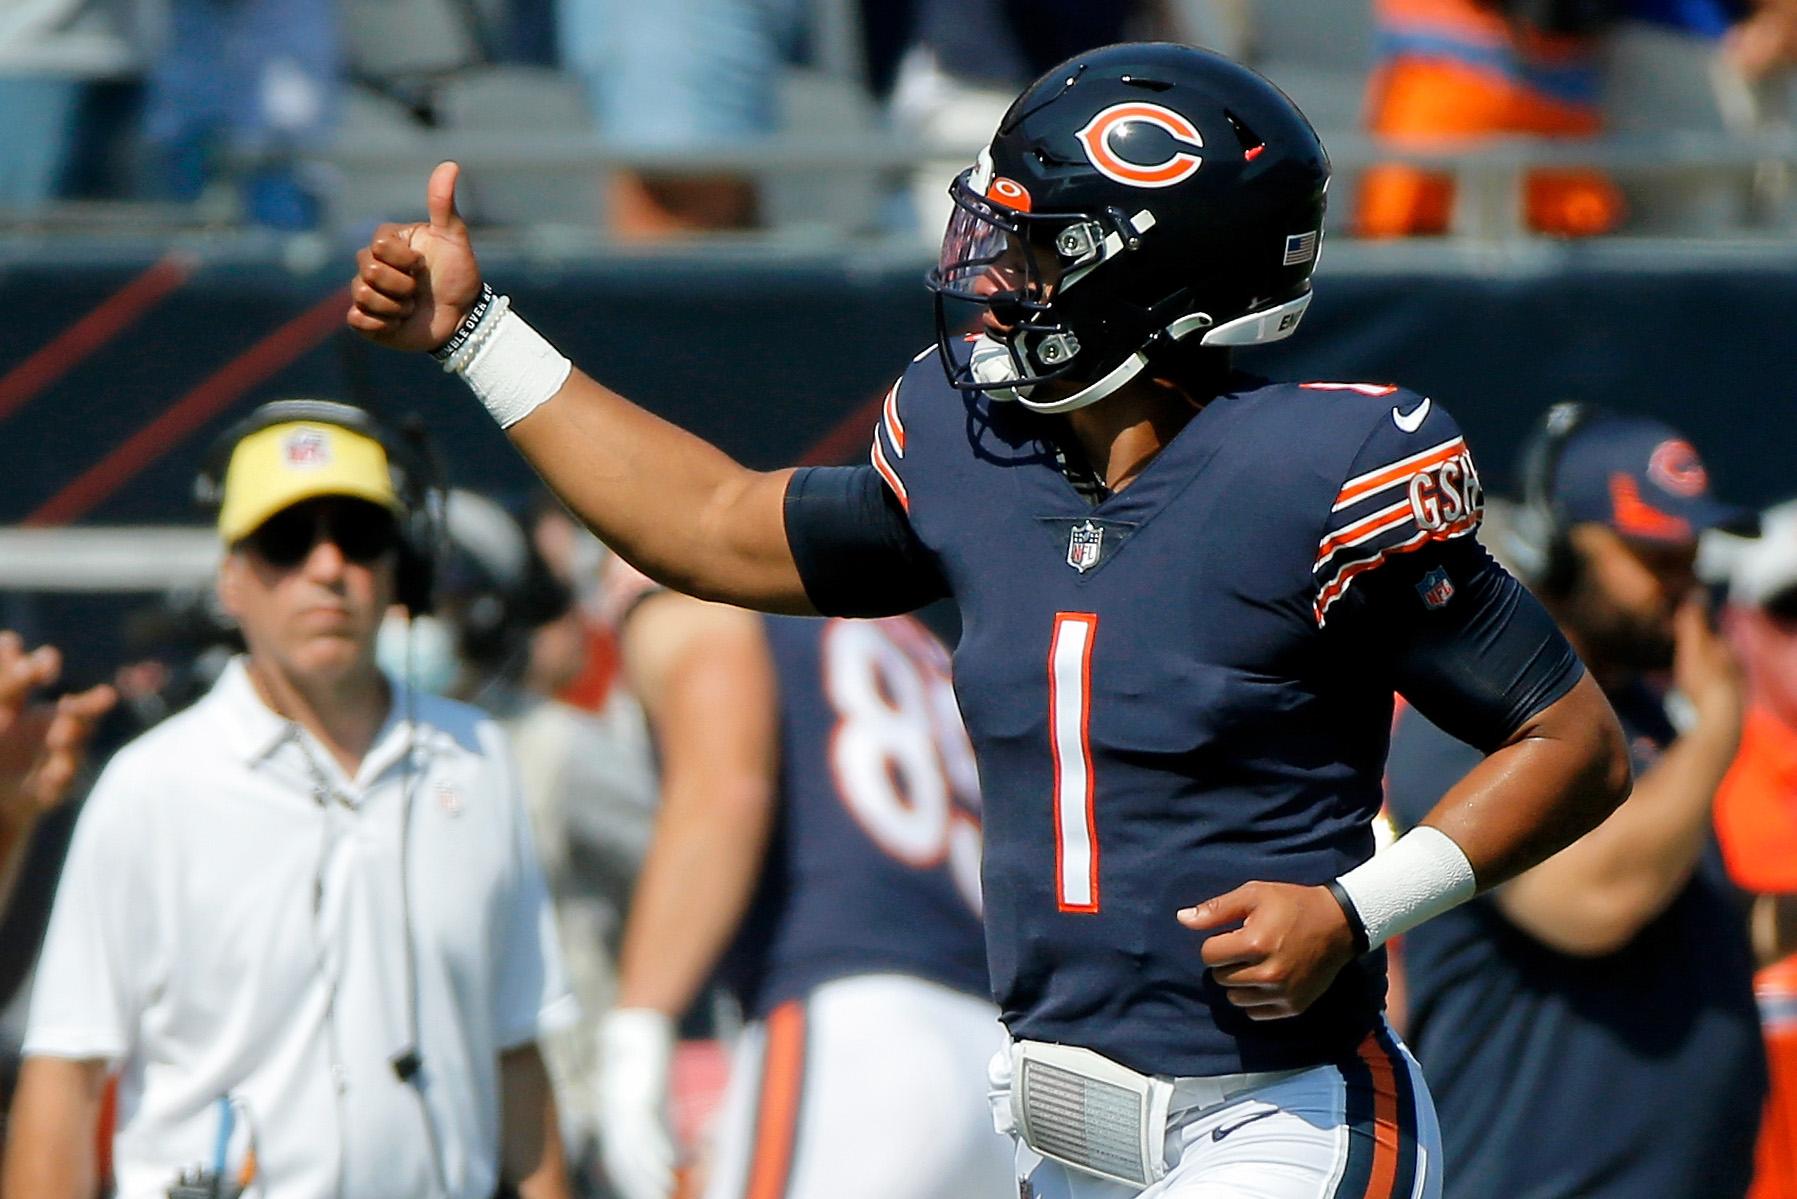 NFL: Cincinnati Bengals at Chicago Bears